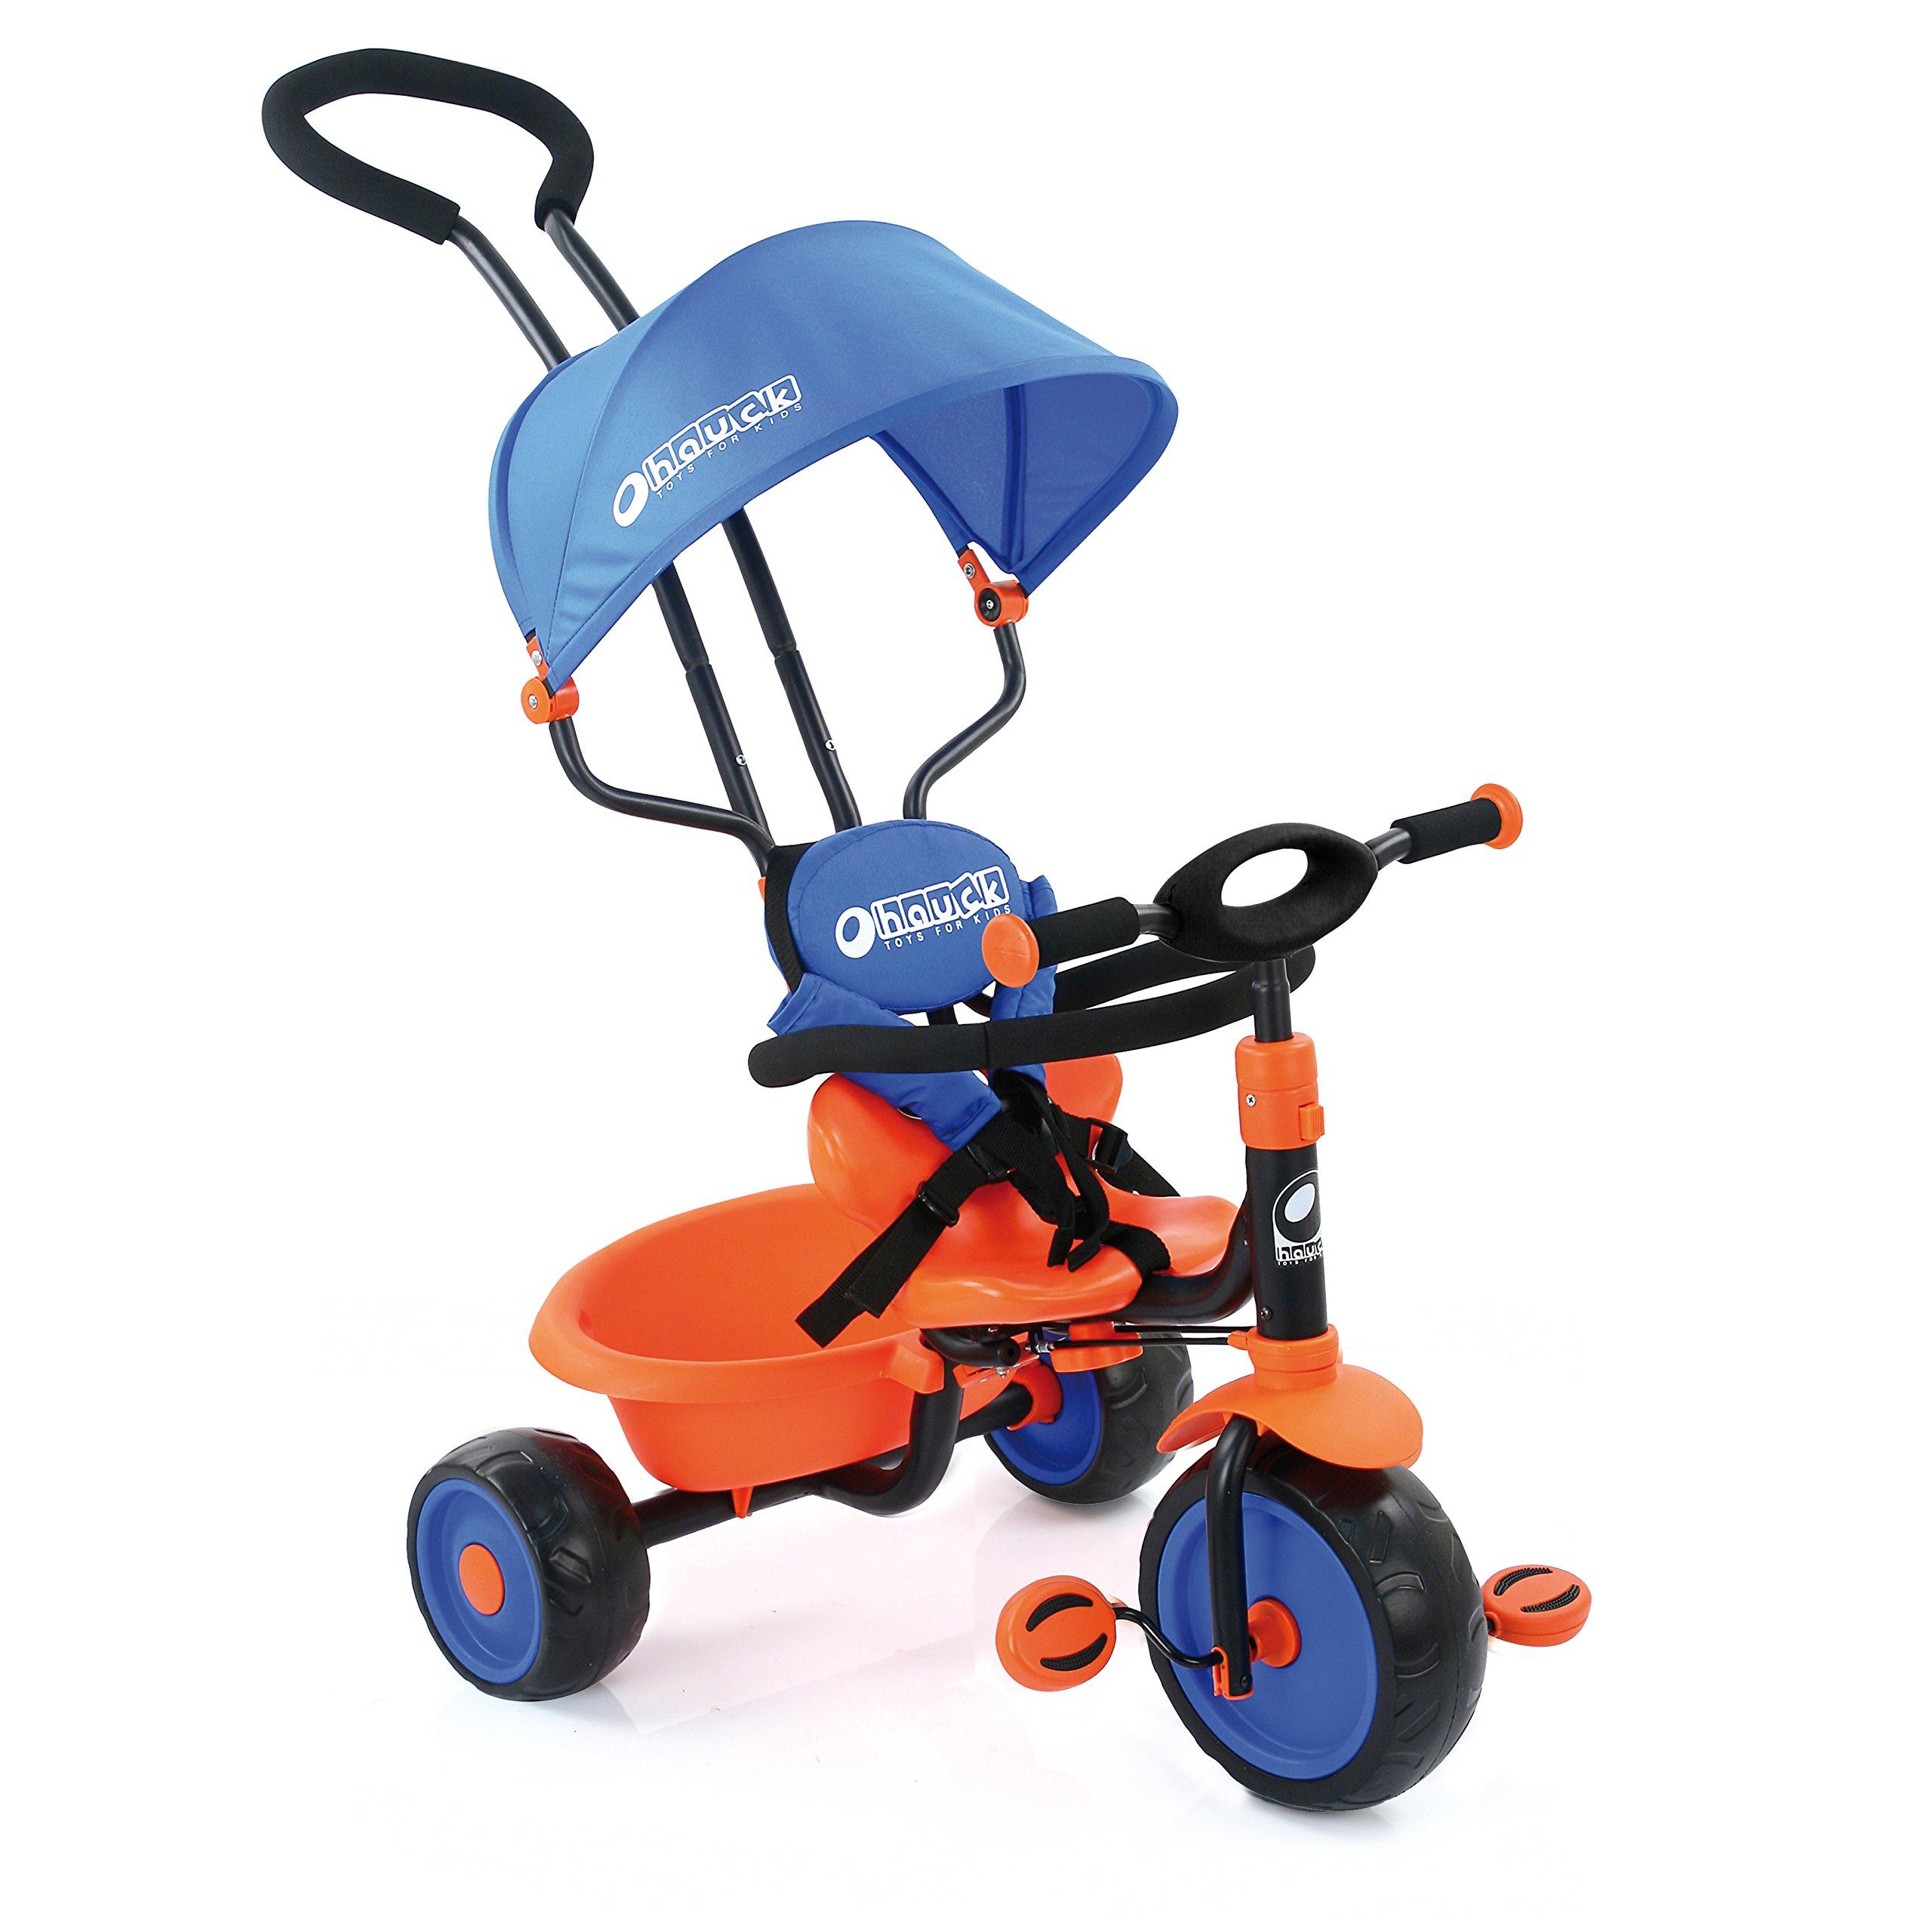 Hauck Explorer Tricycle, Royal Blue/Orange